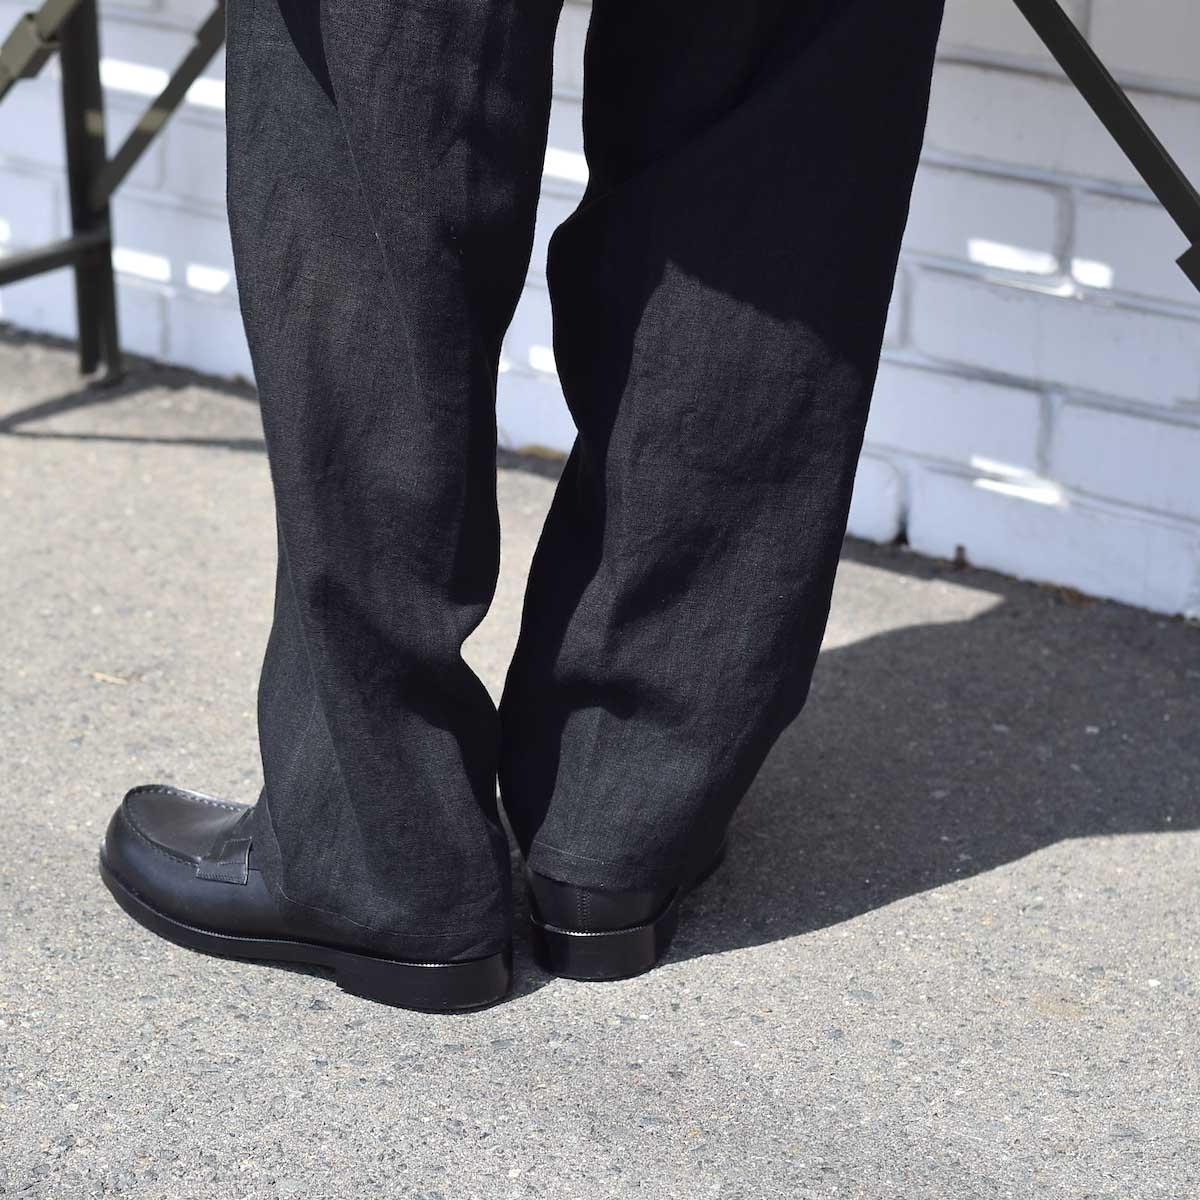 FOOTSTOCK ORIGINALS / LOAFER (Black)着用イメージ2